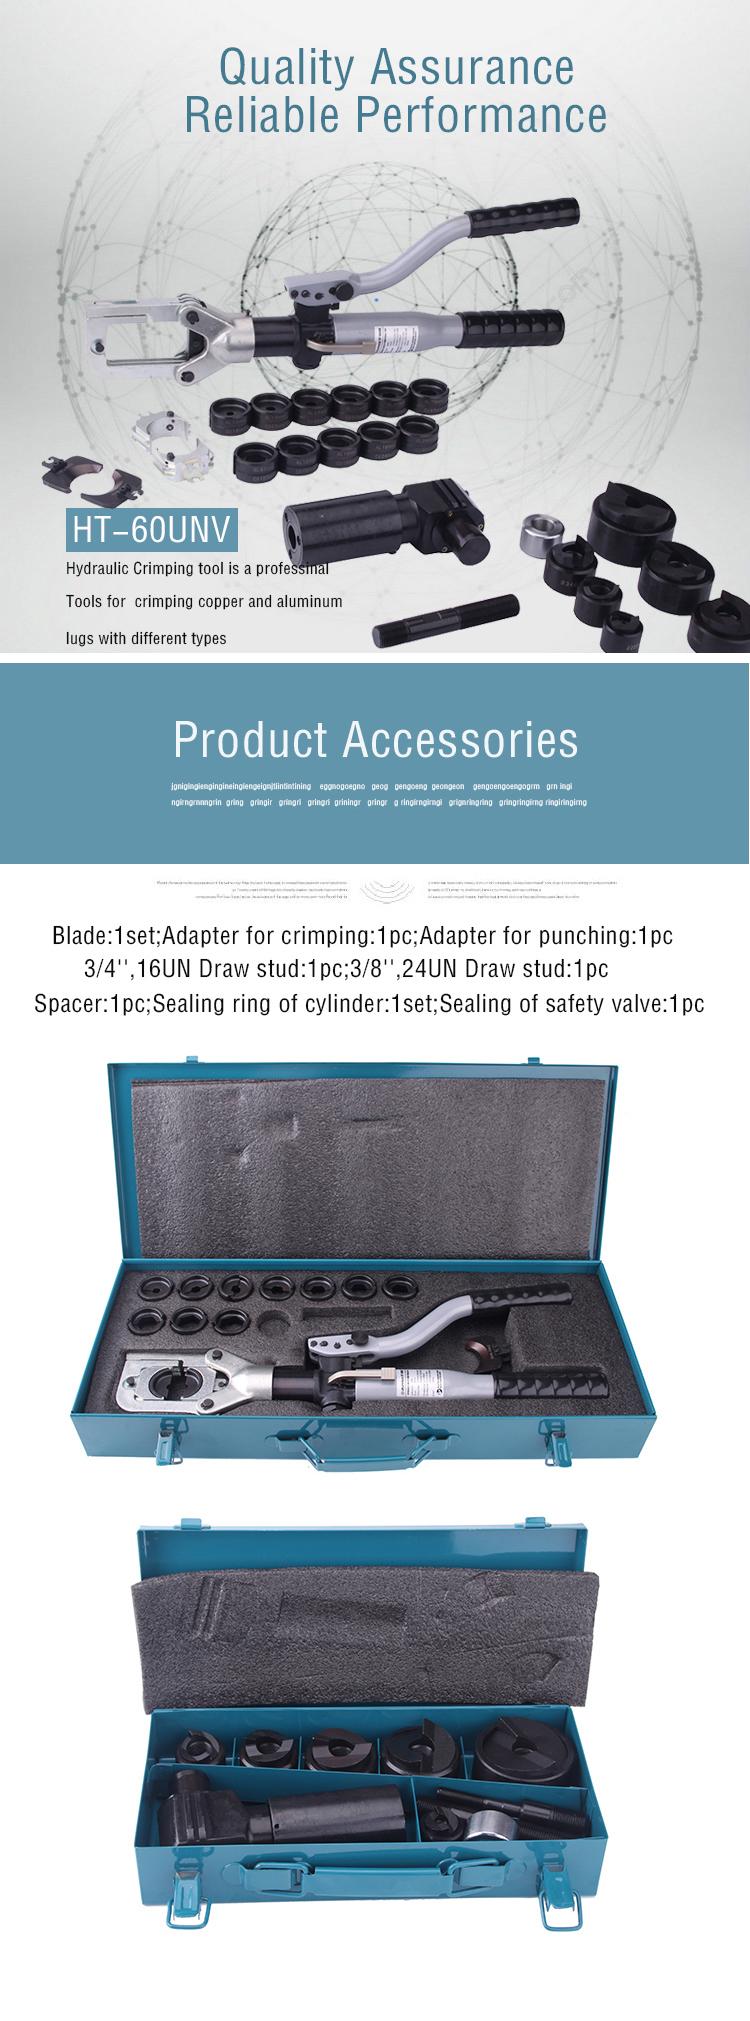 Zupper Hydraulic Crimping Cutting Punching Tool